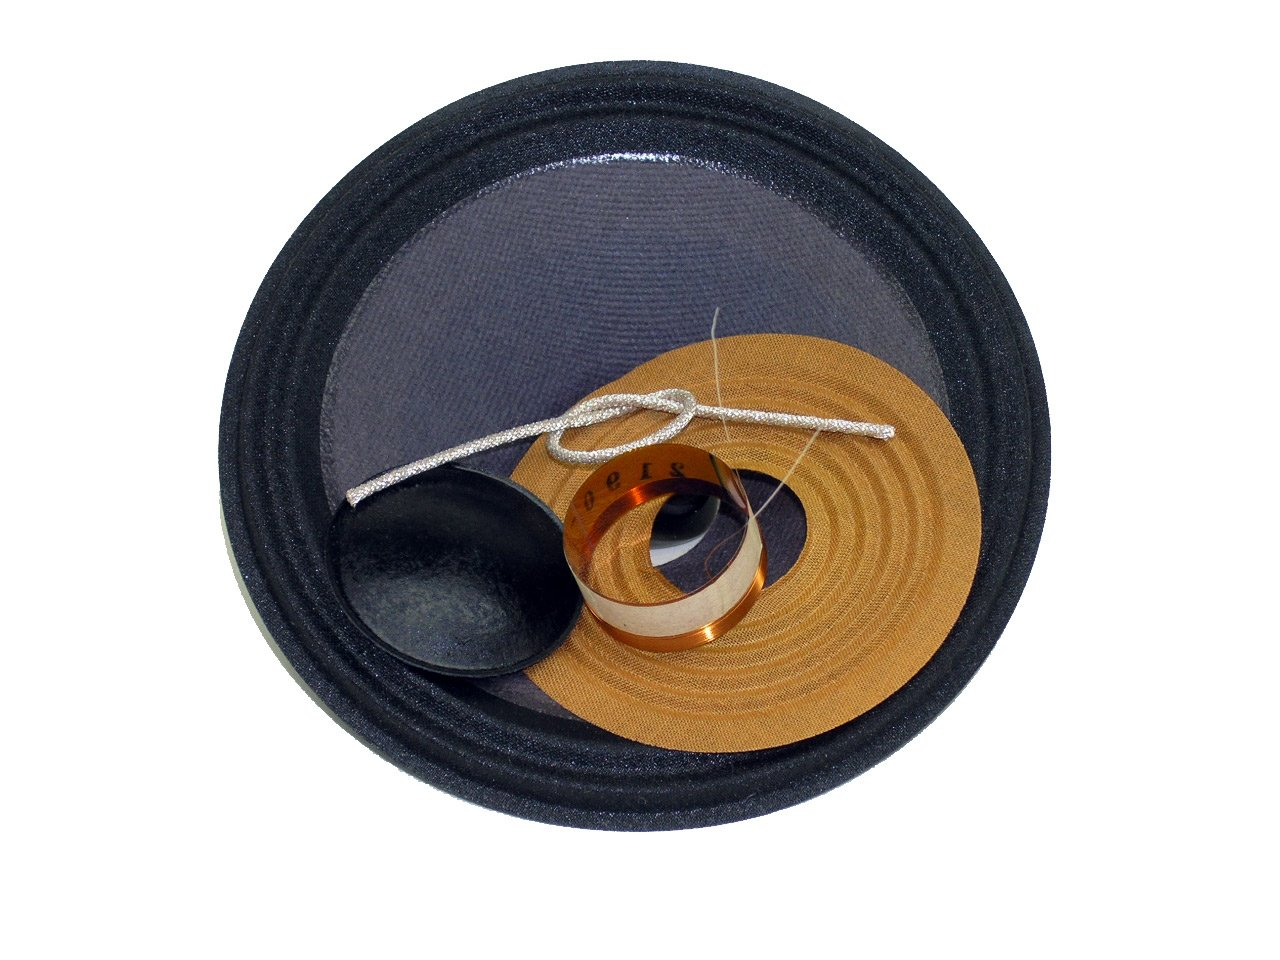 SS Audio Recone Kit for 5'' JBL LE5 Series Midrange, 8 Ohms, RK-JBLLE5